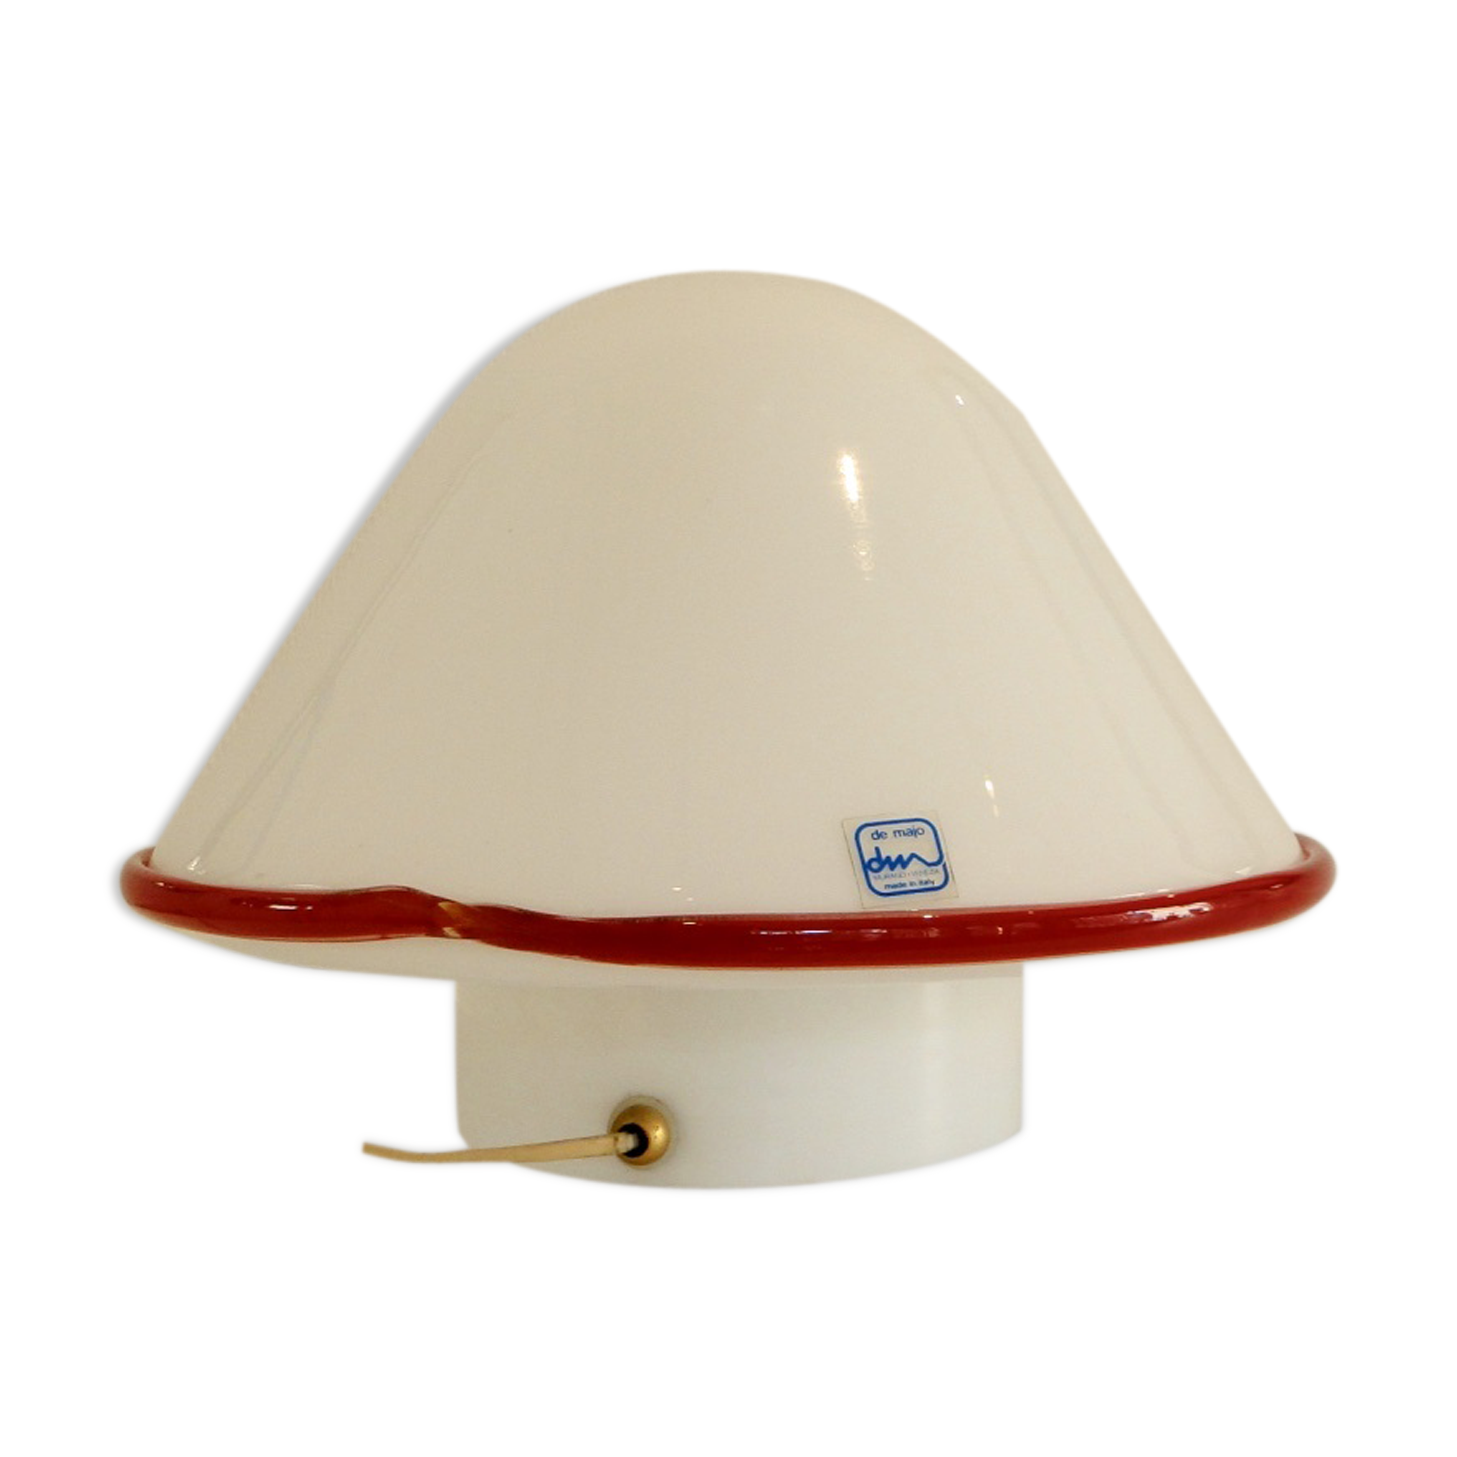 Lampe champignon en verre de Murano par Federico De Majo,1970